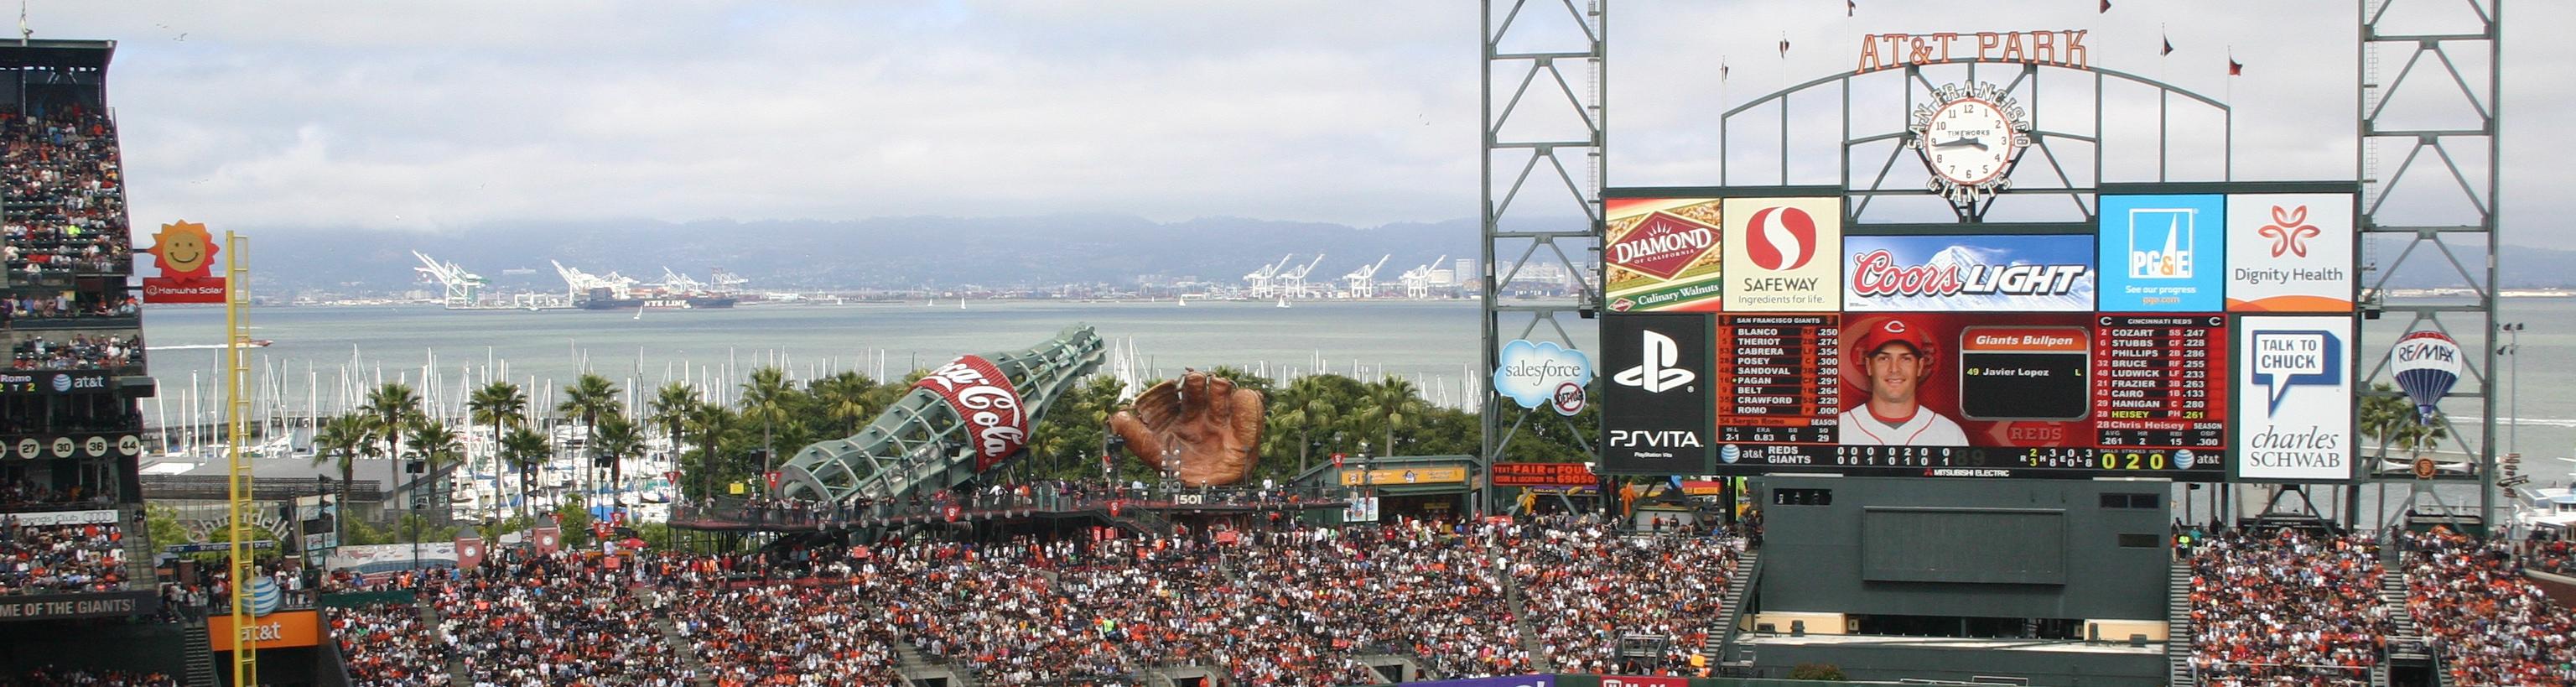 """AT&T Park"",baseball stadium trips,baseball tours"